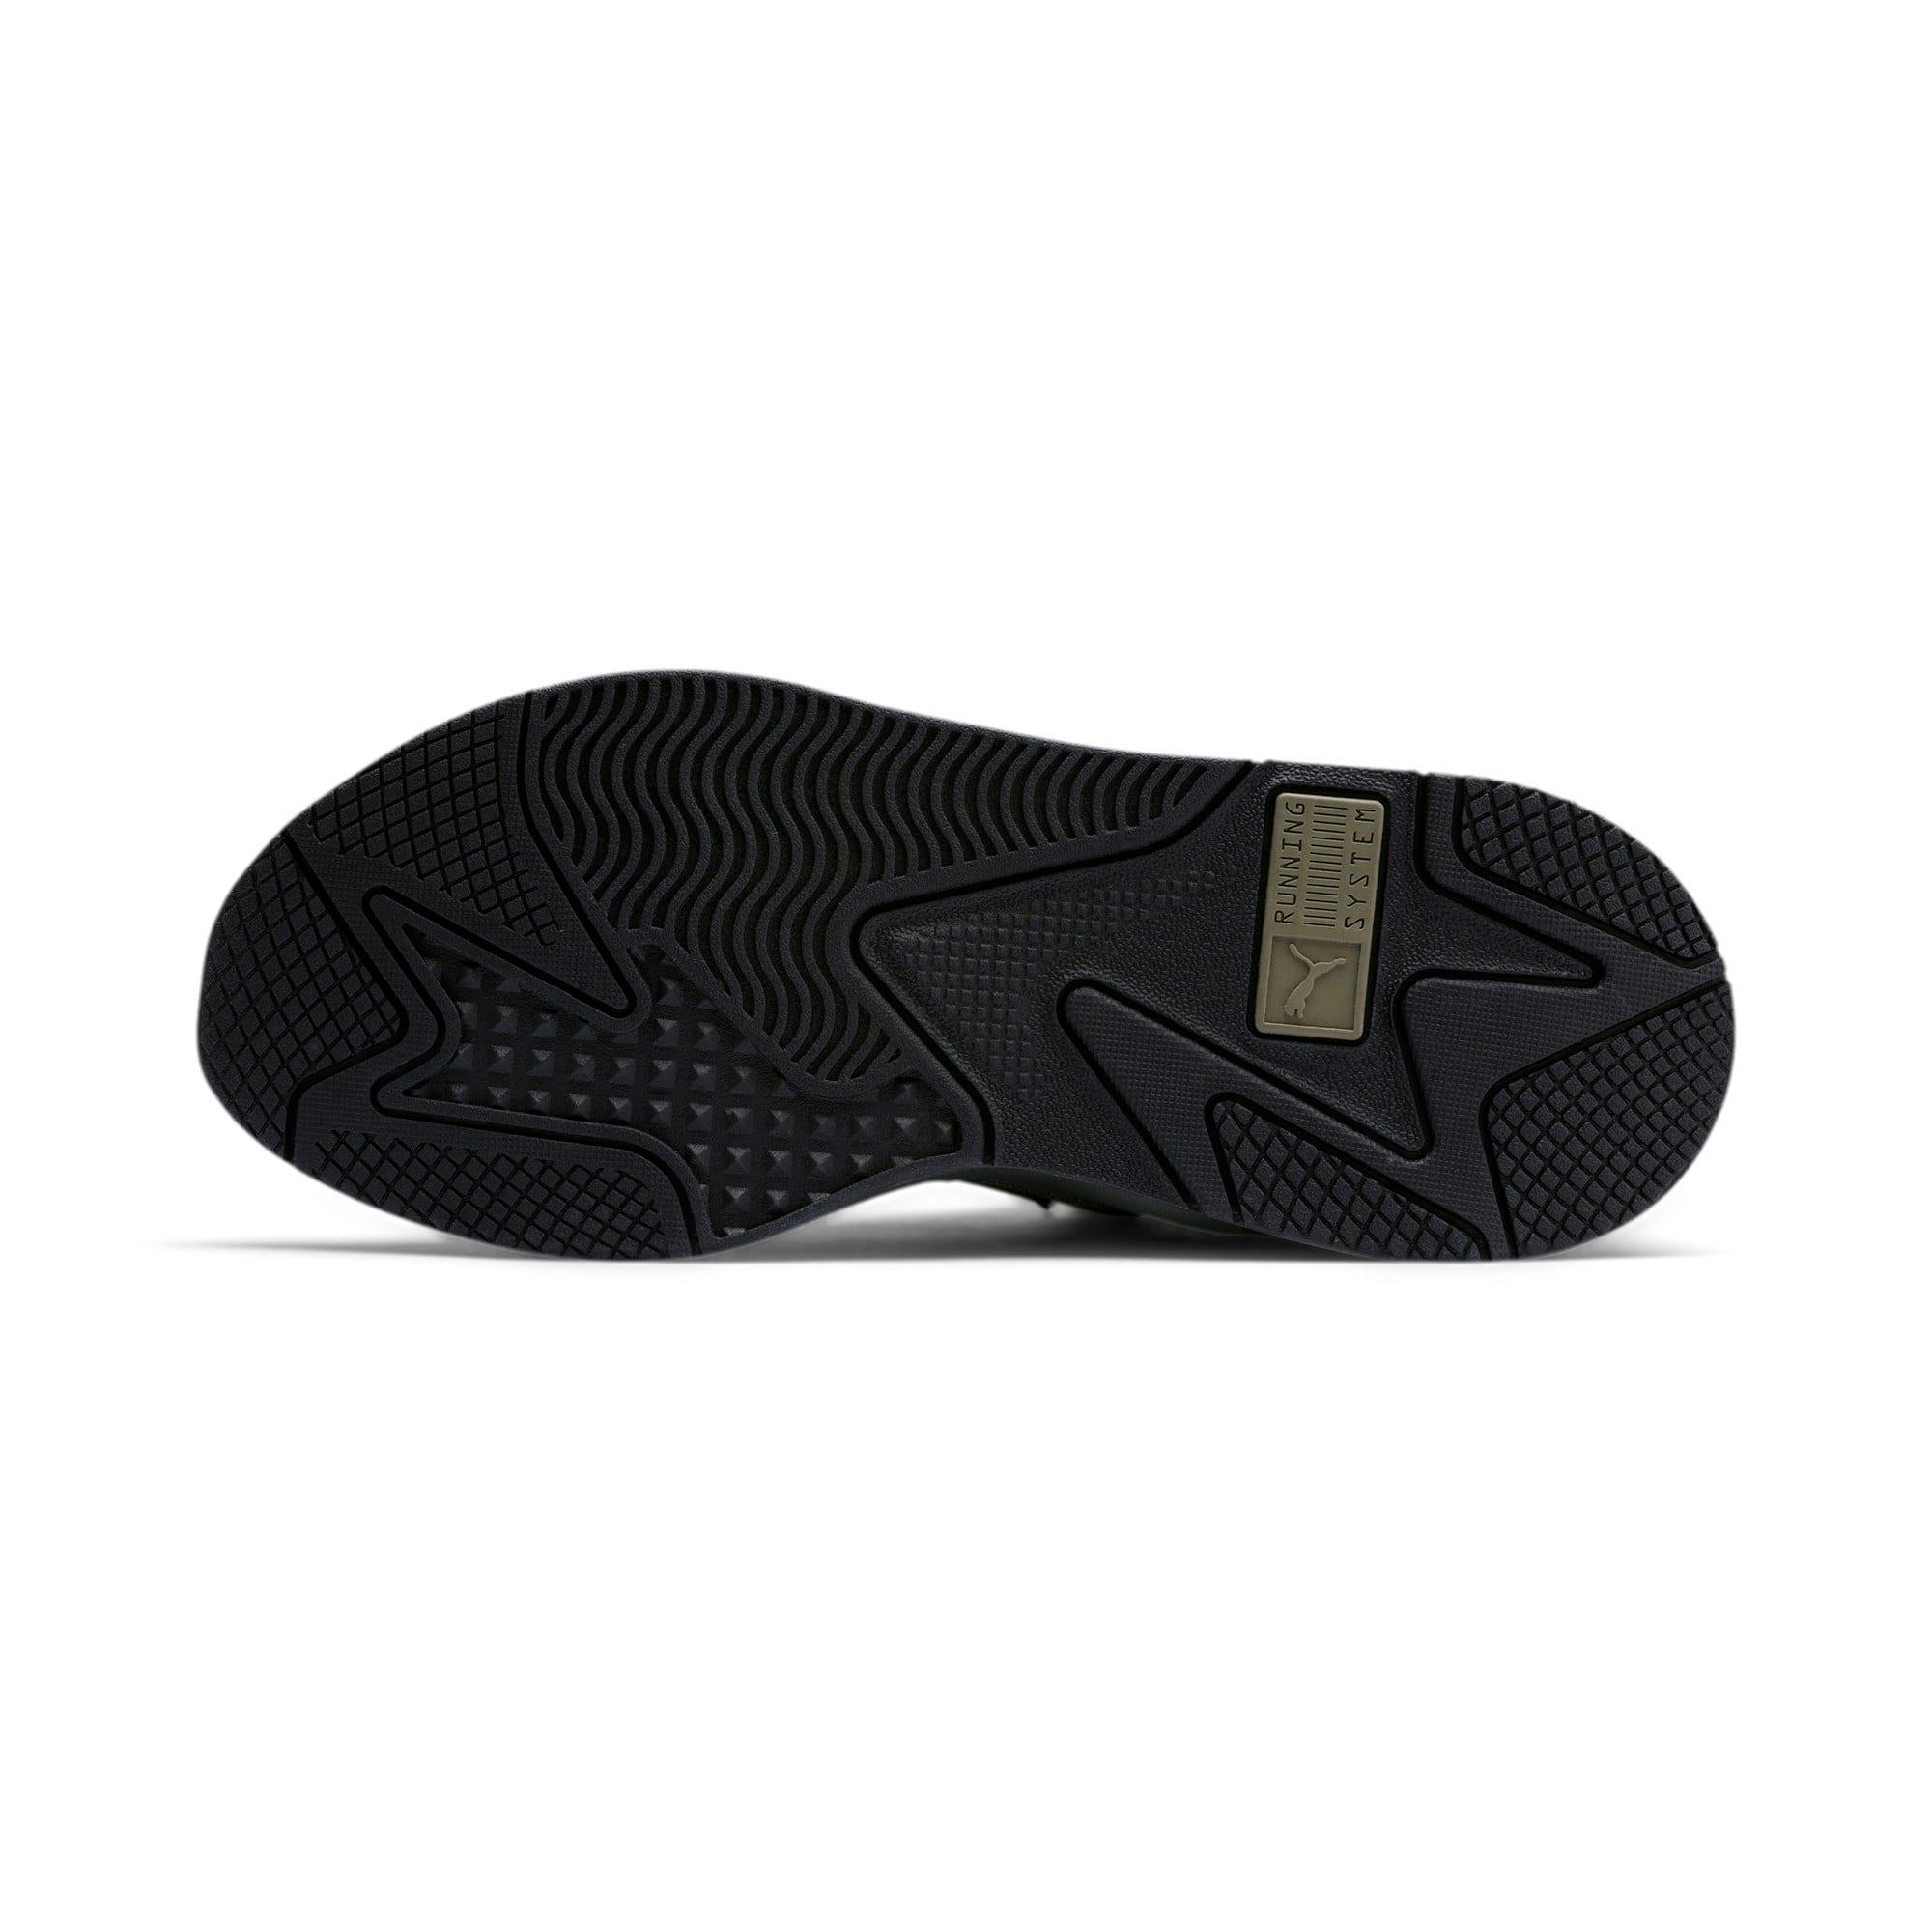 Thumbnail 5 of RS-X Winterized Sneakers, Puma Black-Burnt Olive, medium